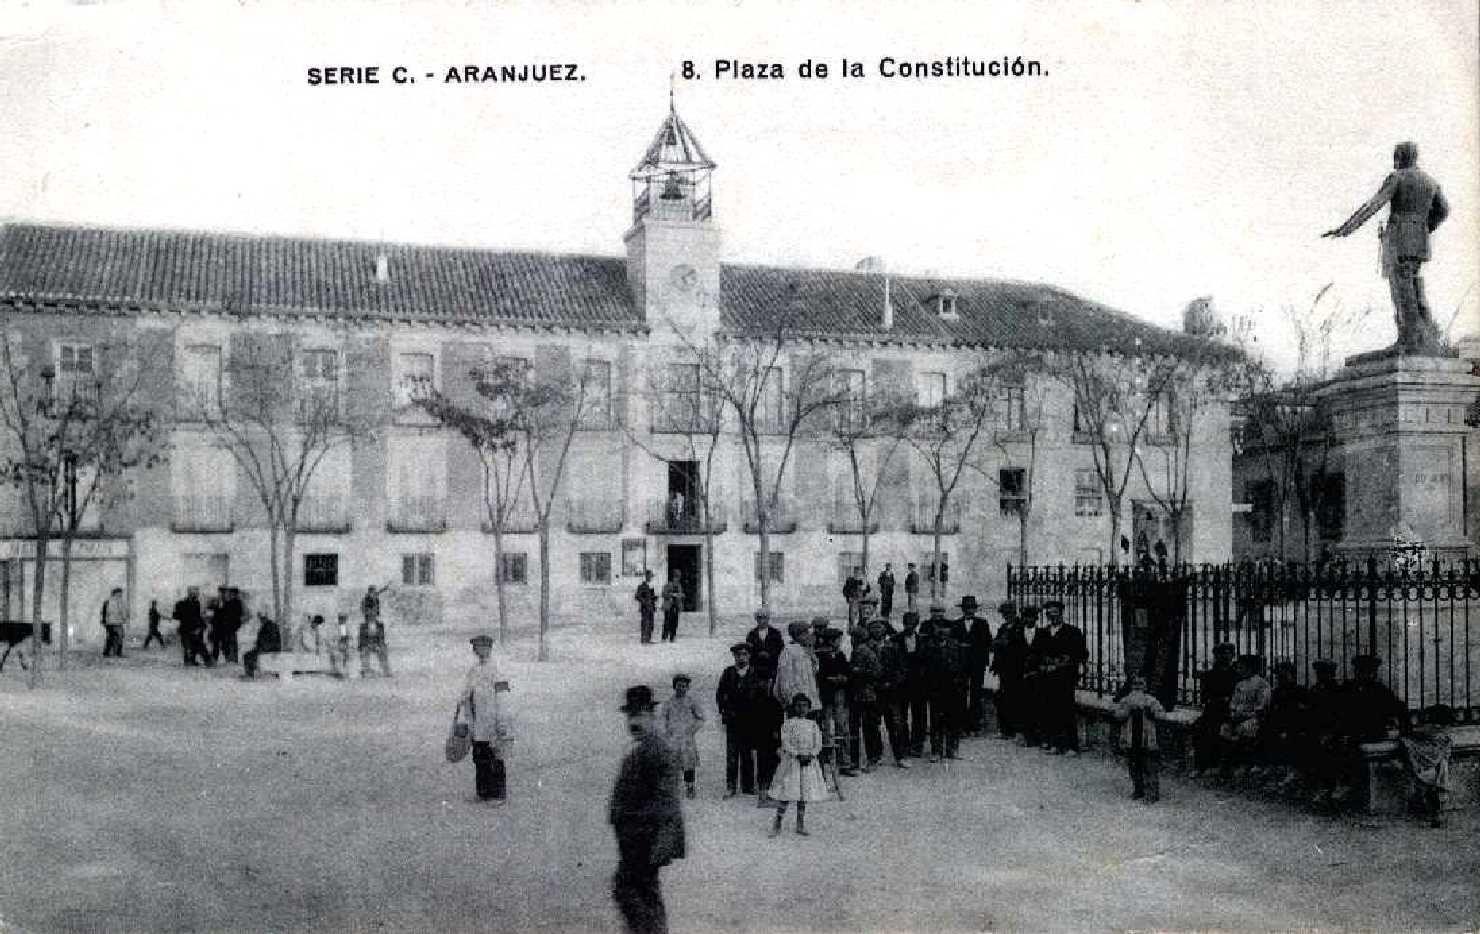 Diy clothespin crafts diy clothespin crafts pictures to pin on - Aranjuez Buscar Con Google Aranjuez Antiguo